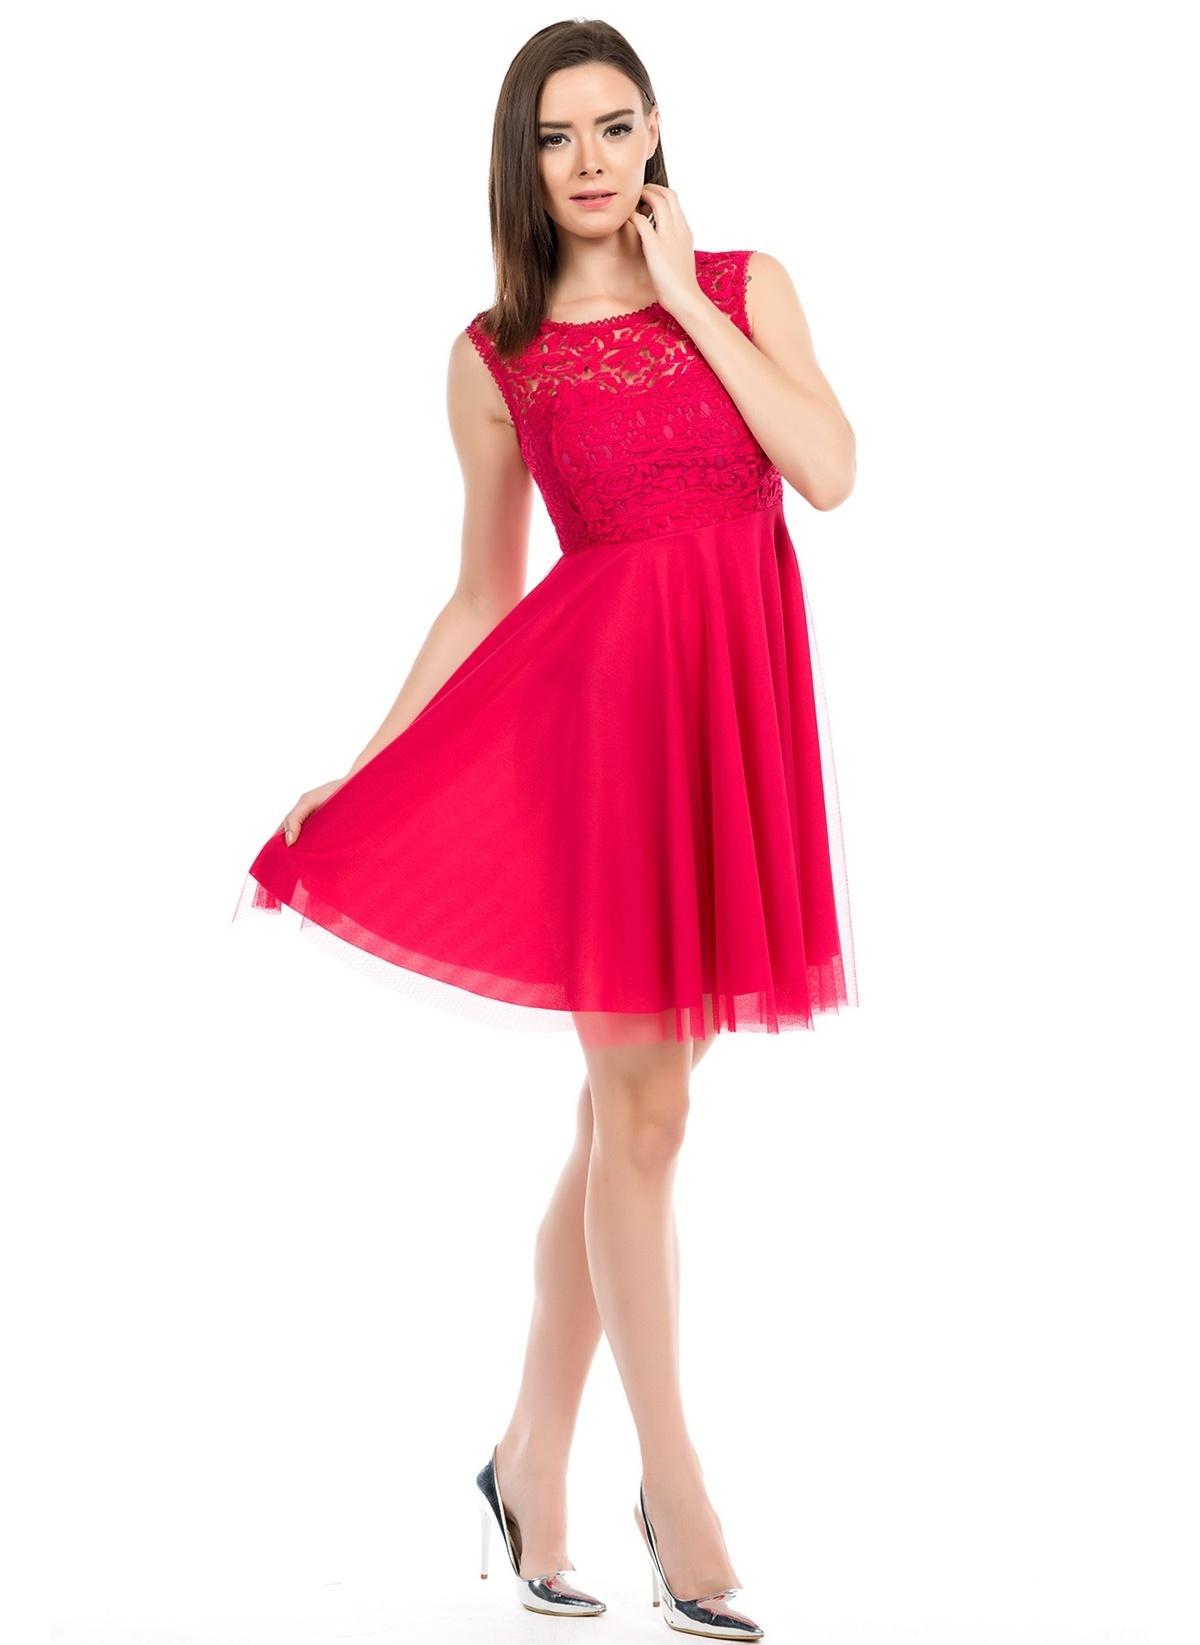 52ad3ca901c76 İroni Kadın Öpücük Yaka Kısa Elbise Fusya | Morhipo | 15423311